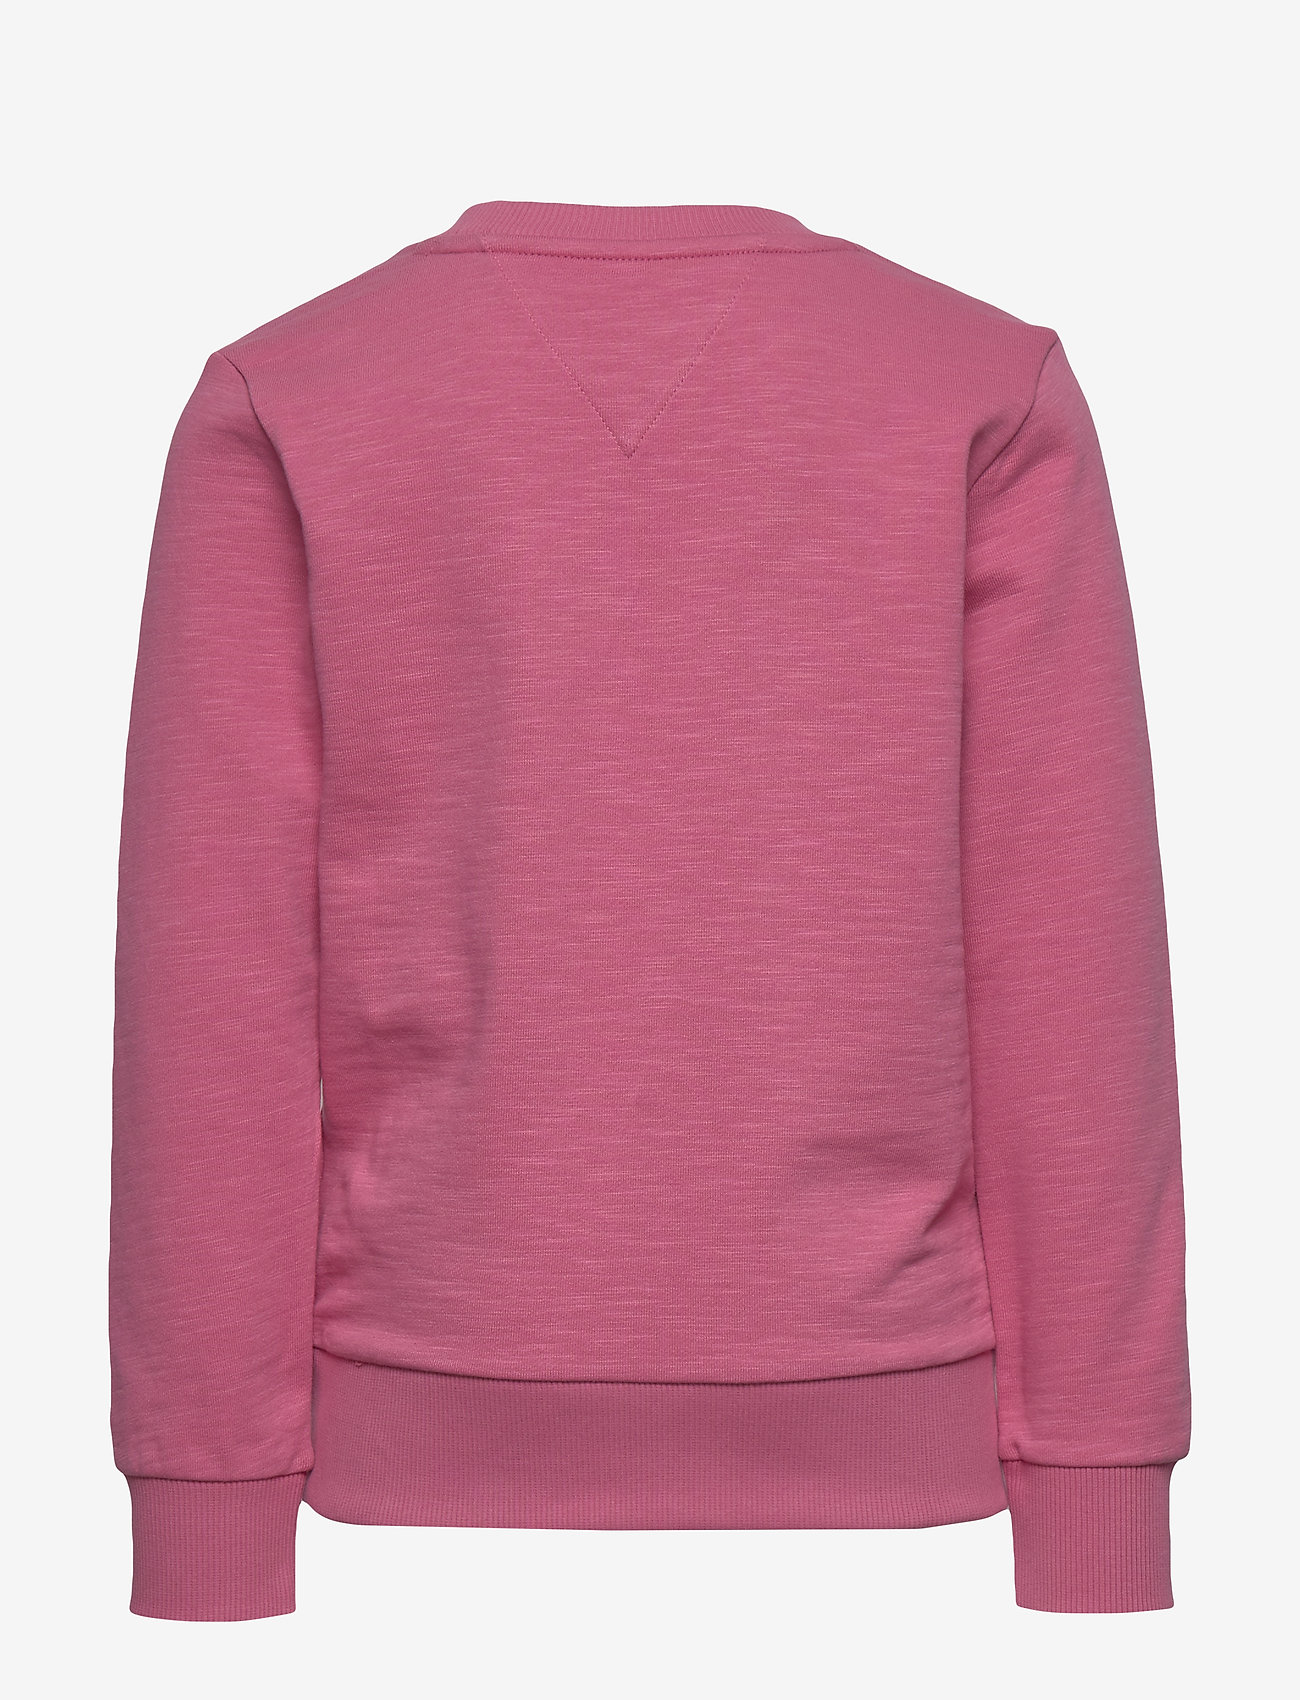 Tommy Hilfiger - ESSENTIAL LOGO SWEAT - sweatshirts - light cerise pink - 1